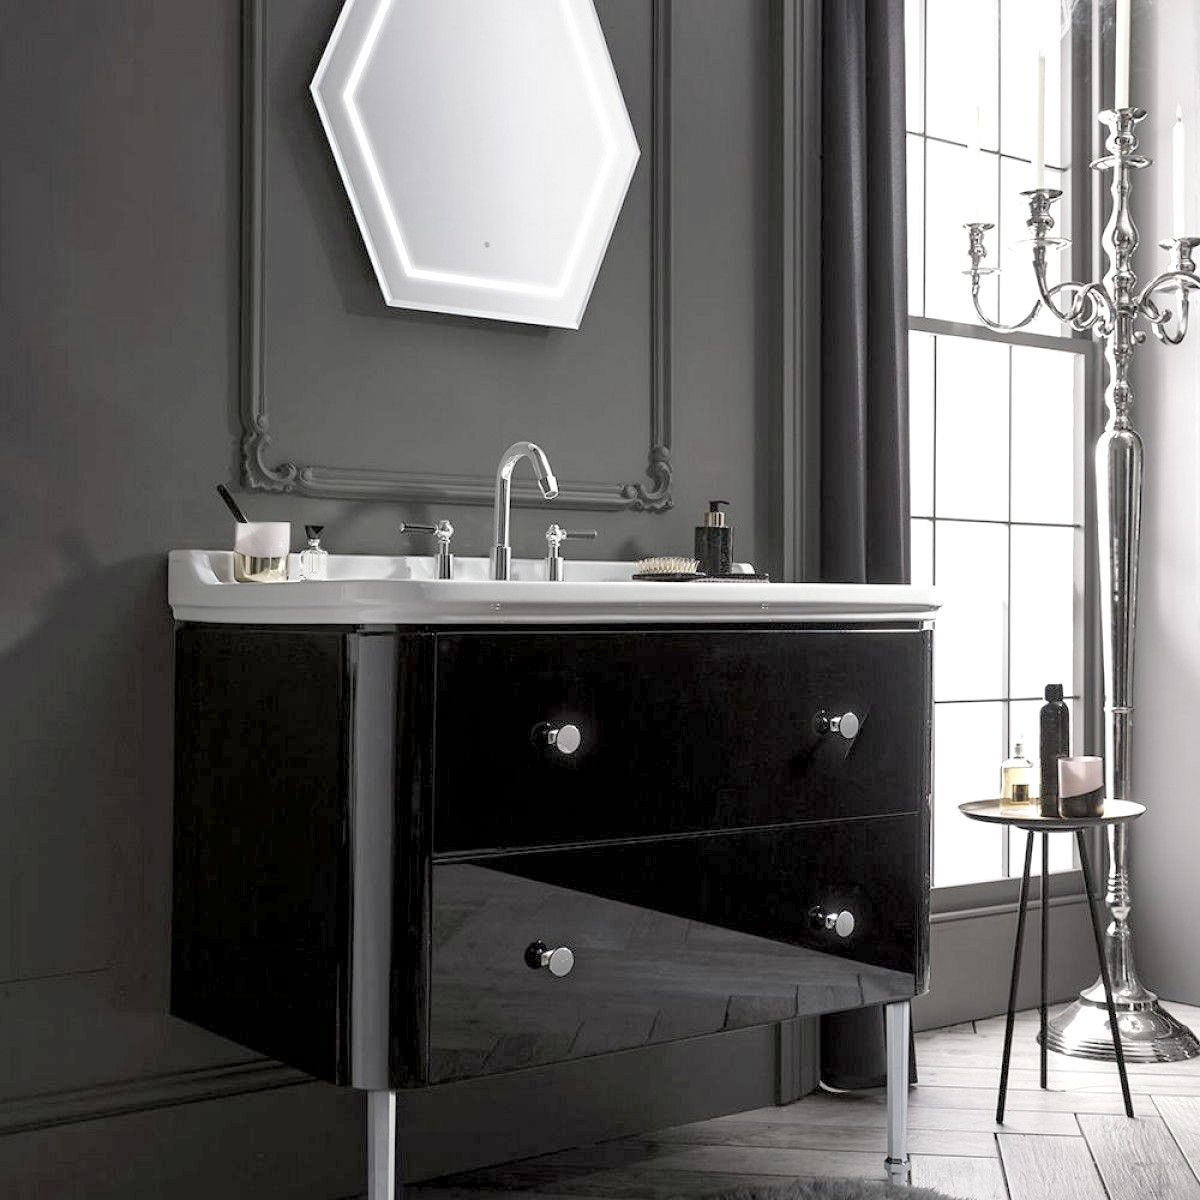 Bathroom Sink Vanity Units Uk Image